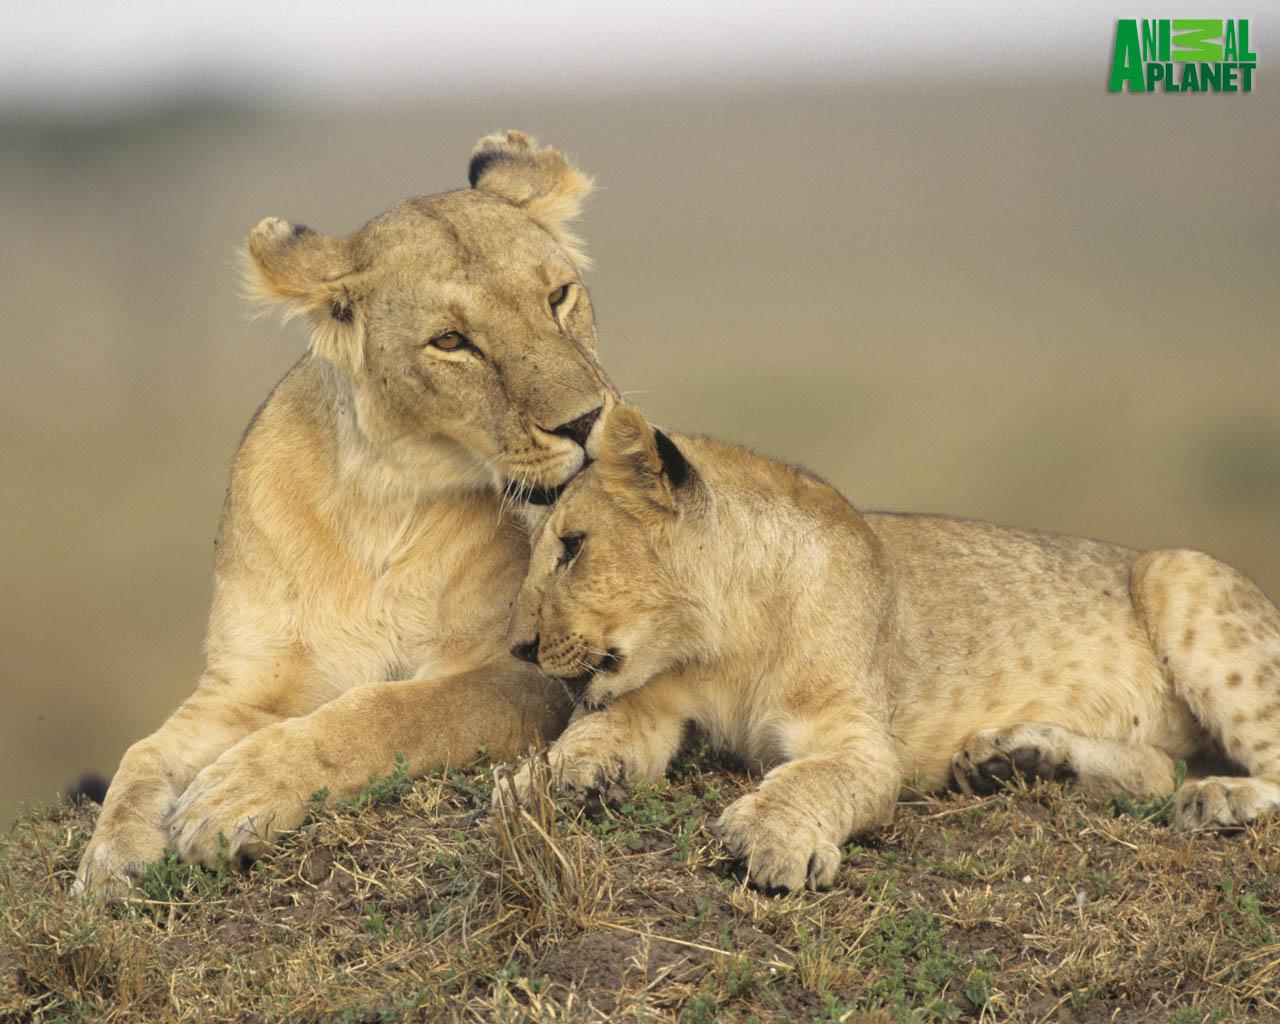 Animal Planet Wallpaper Download   lio 1280x1024